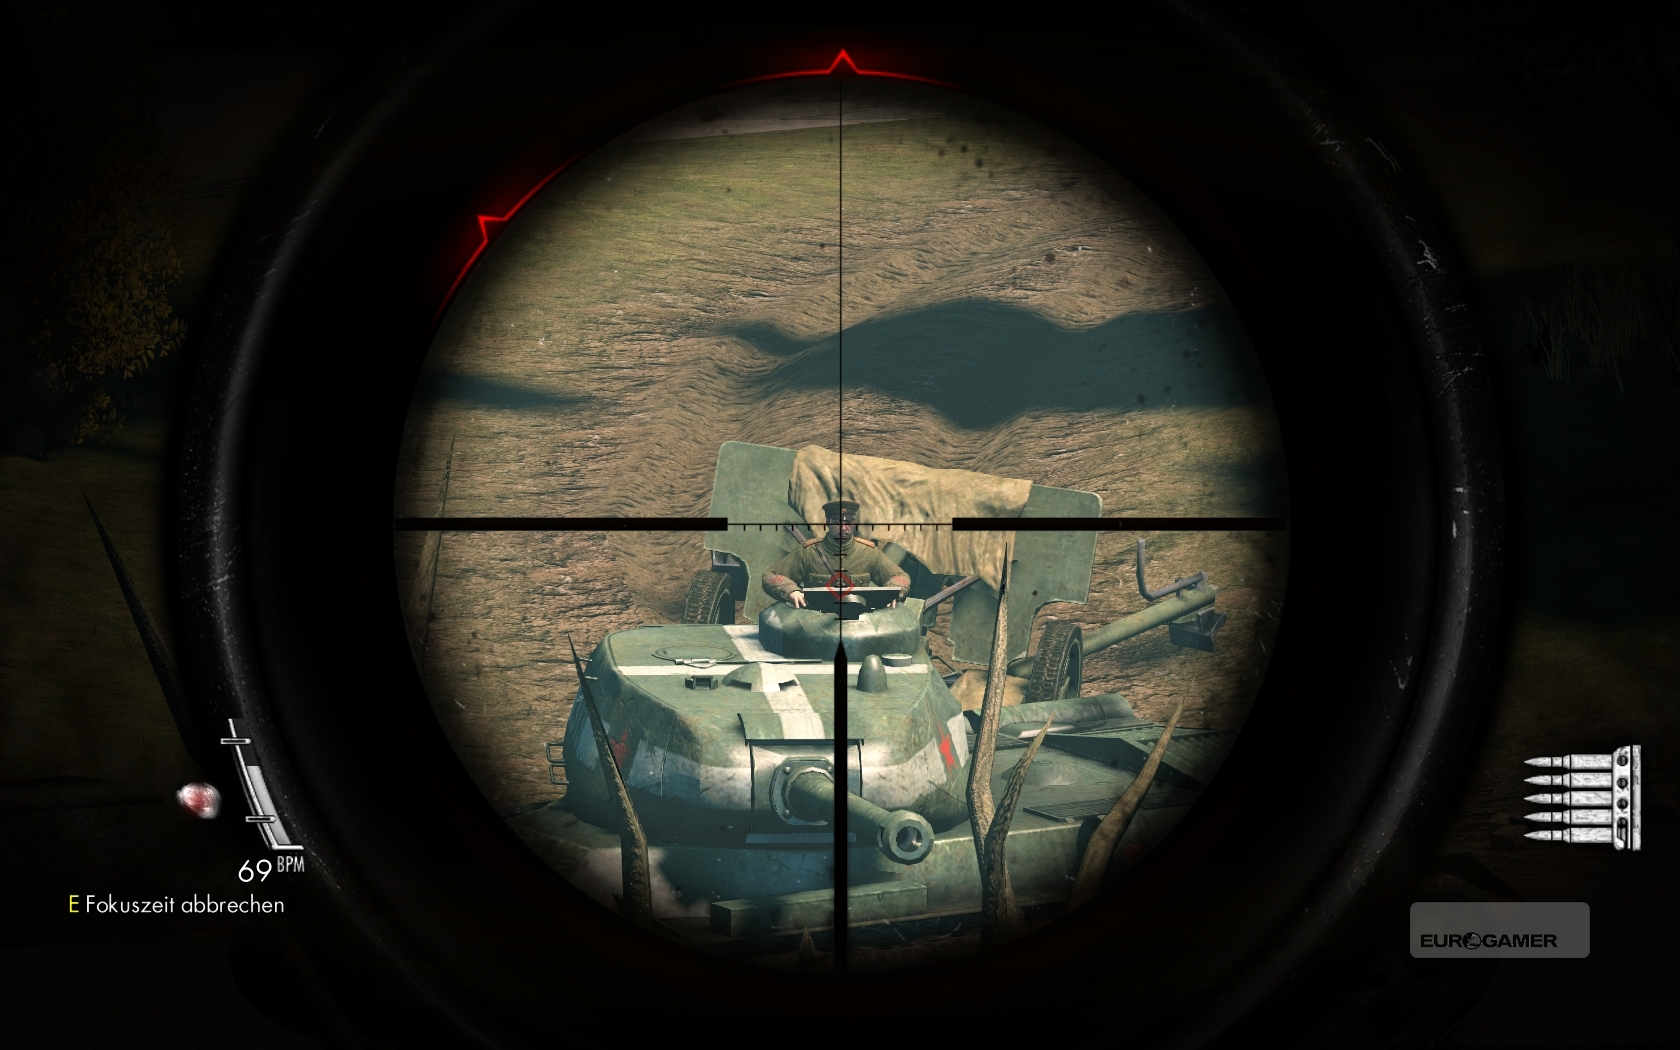 Sniper Elite V2 video game wallpapers Wallpaper 1 of 124 1680x1050